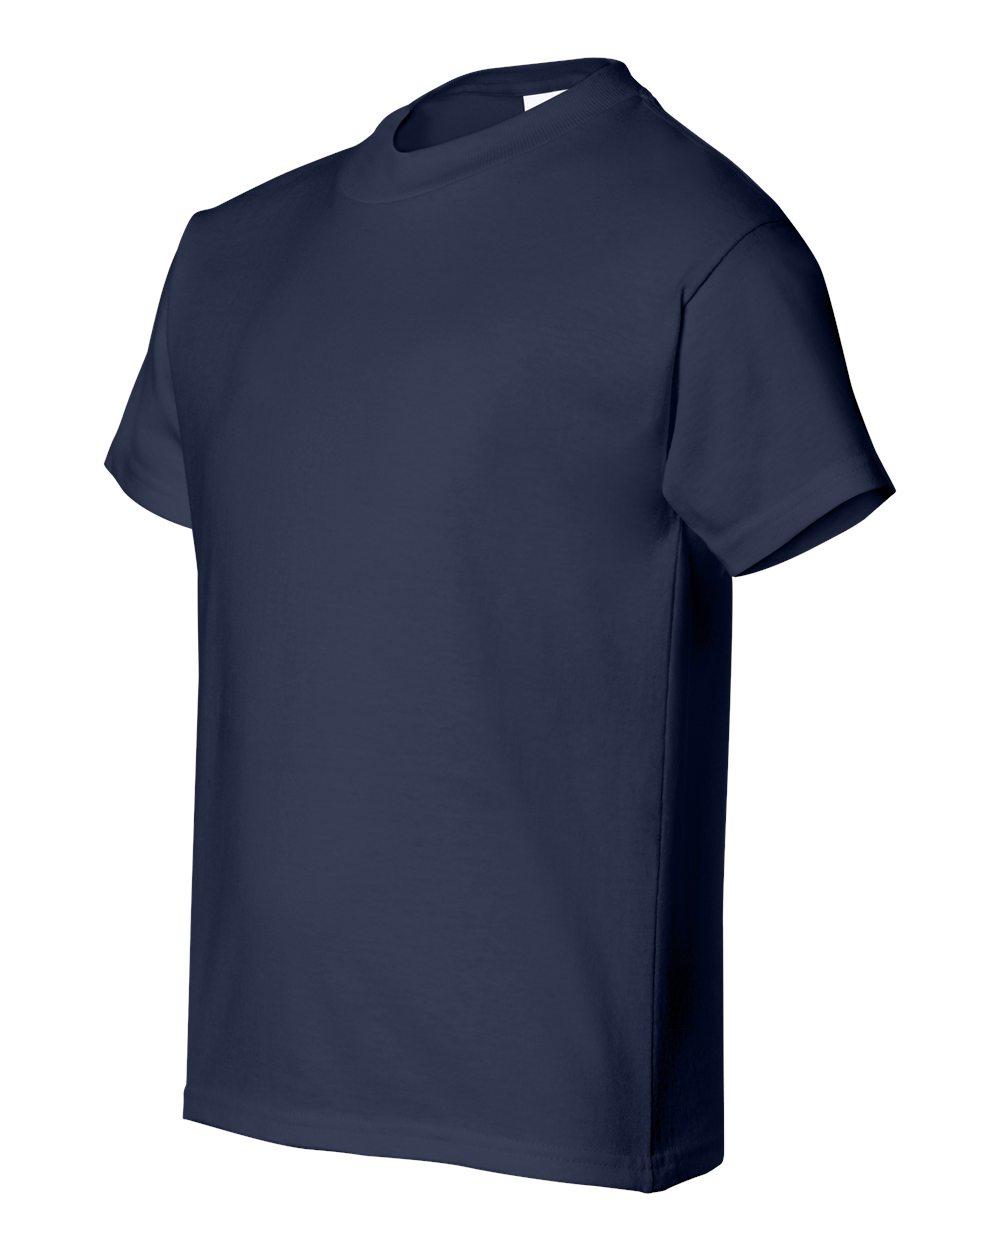 Hanes 5480 - ComfortSoft Heavyweight Youth T-Shirt